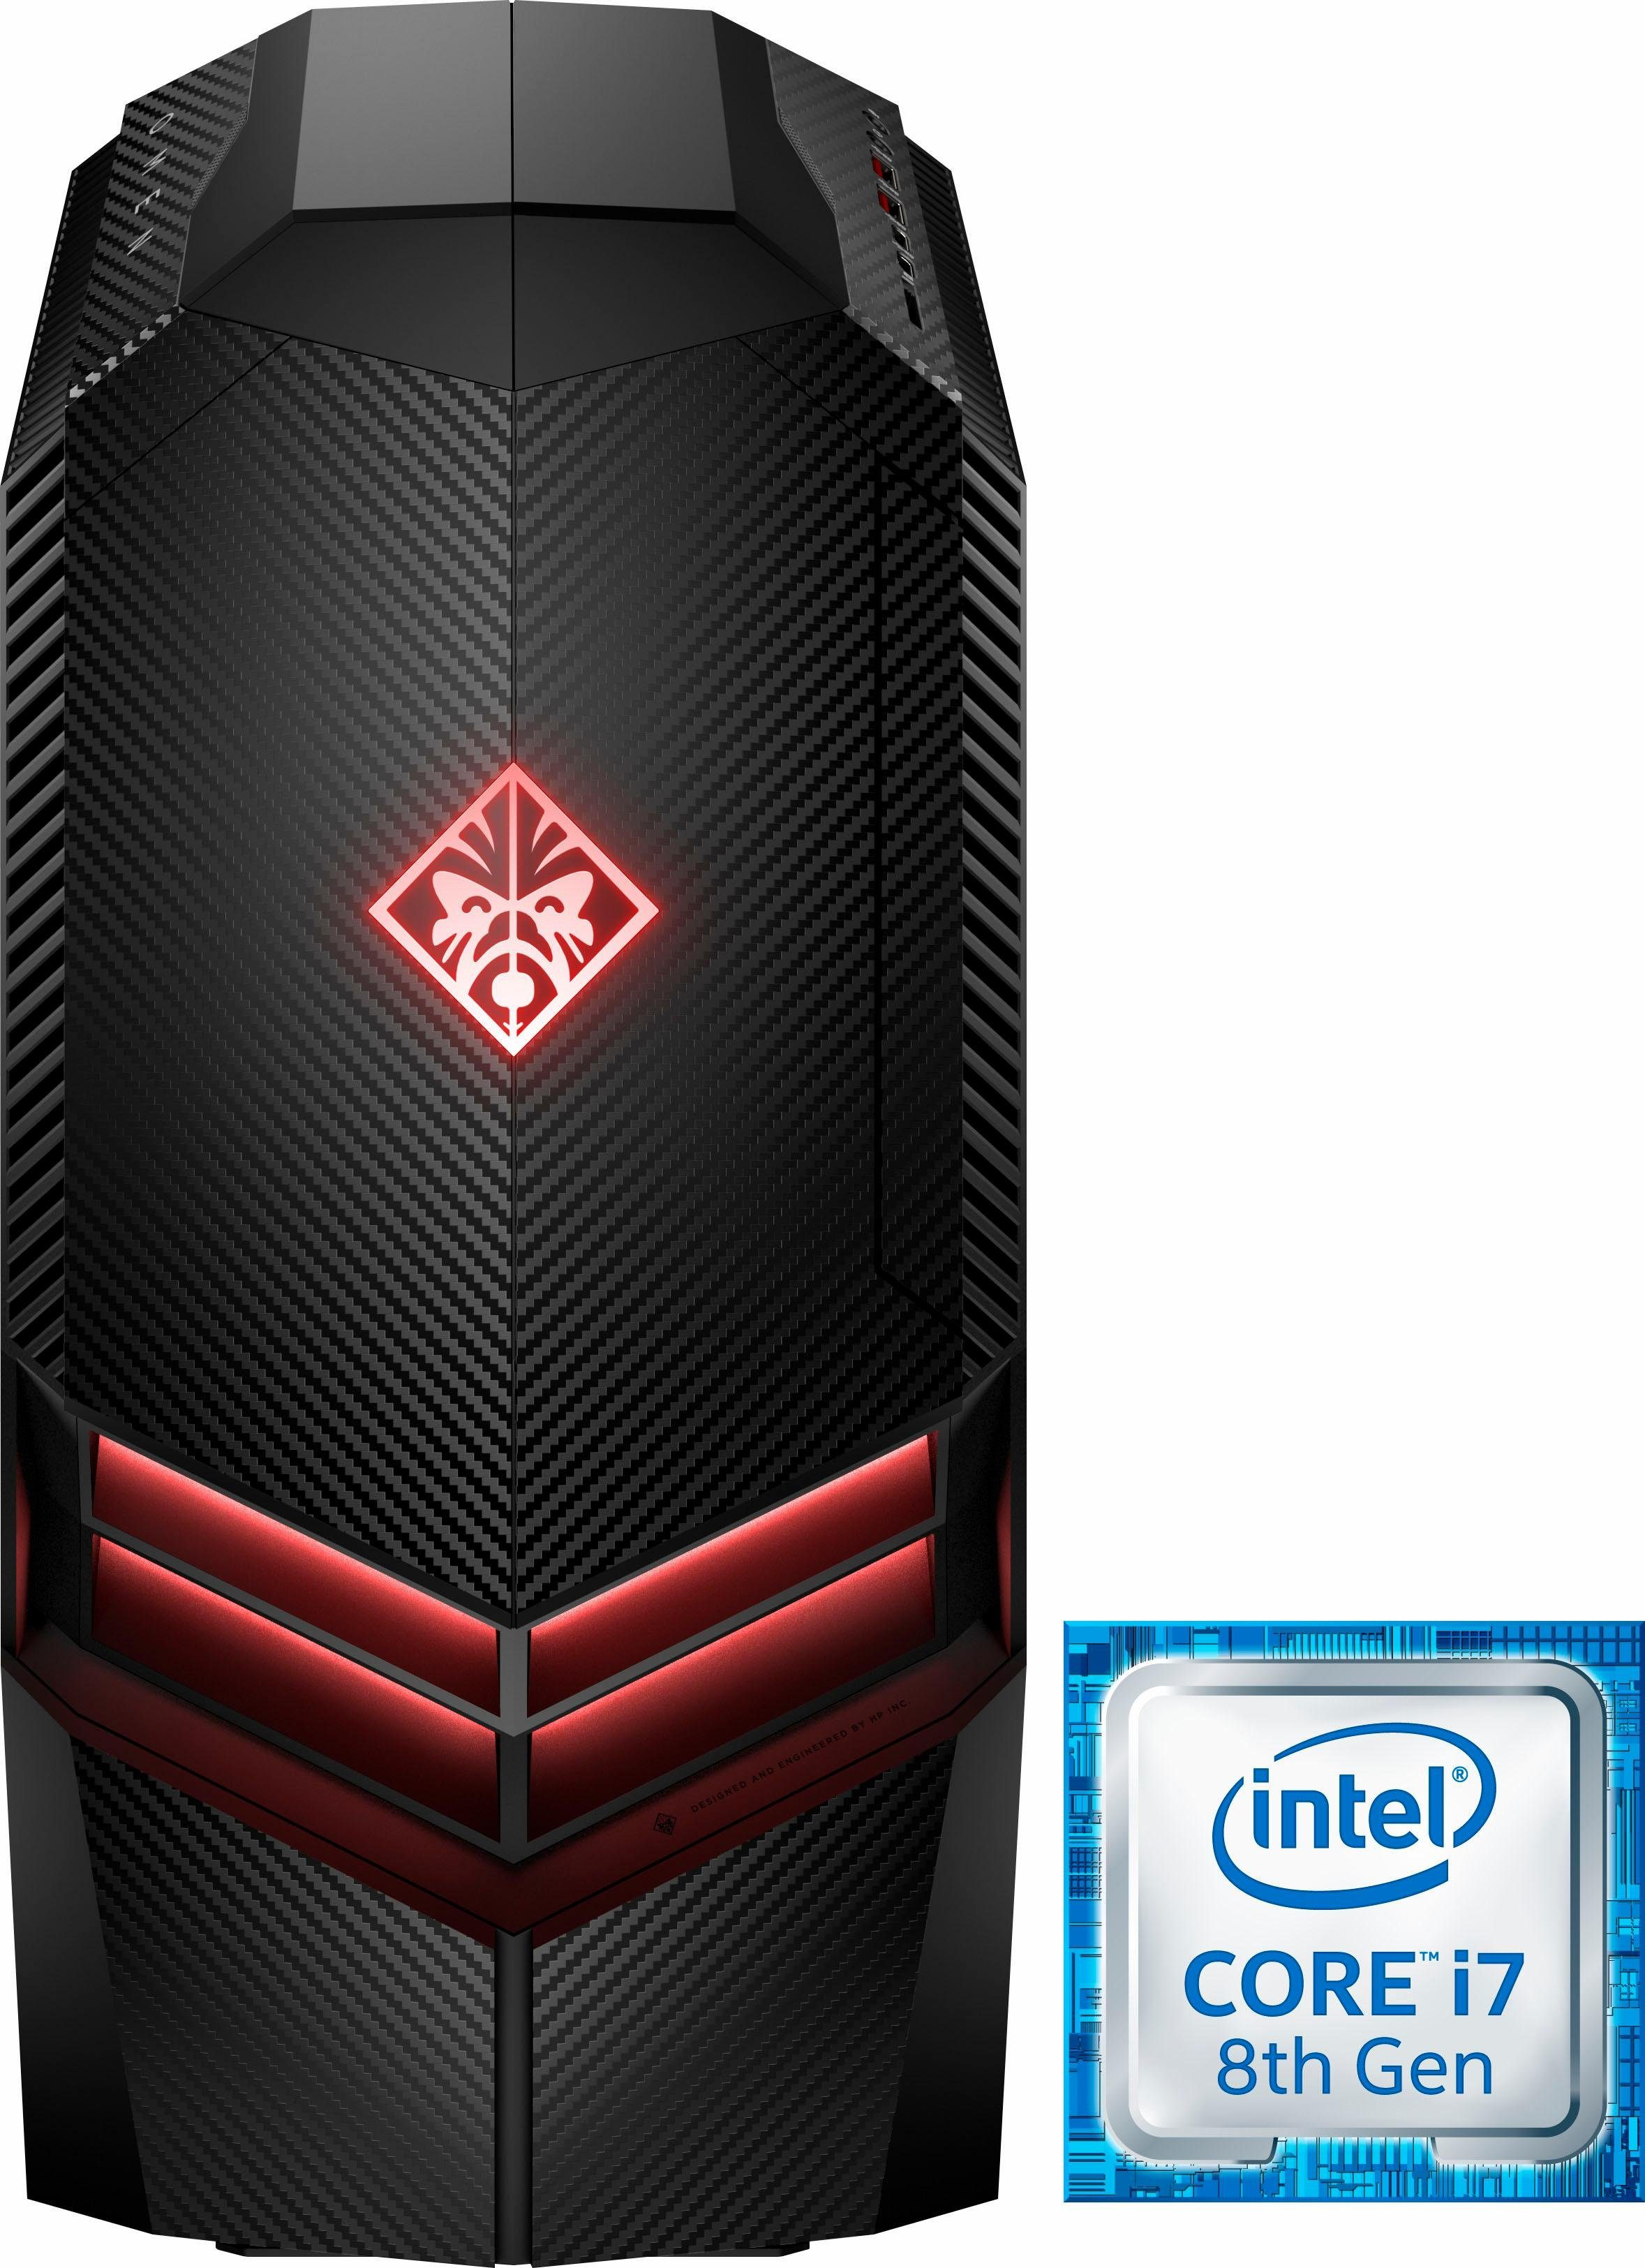 OMEN by HP 880-158ng Gaming-PC (Intel Core i7, GTX 1070, 16 GB RAM, 1000 GB HDD, 256 GB SSD, Luftkühlung)